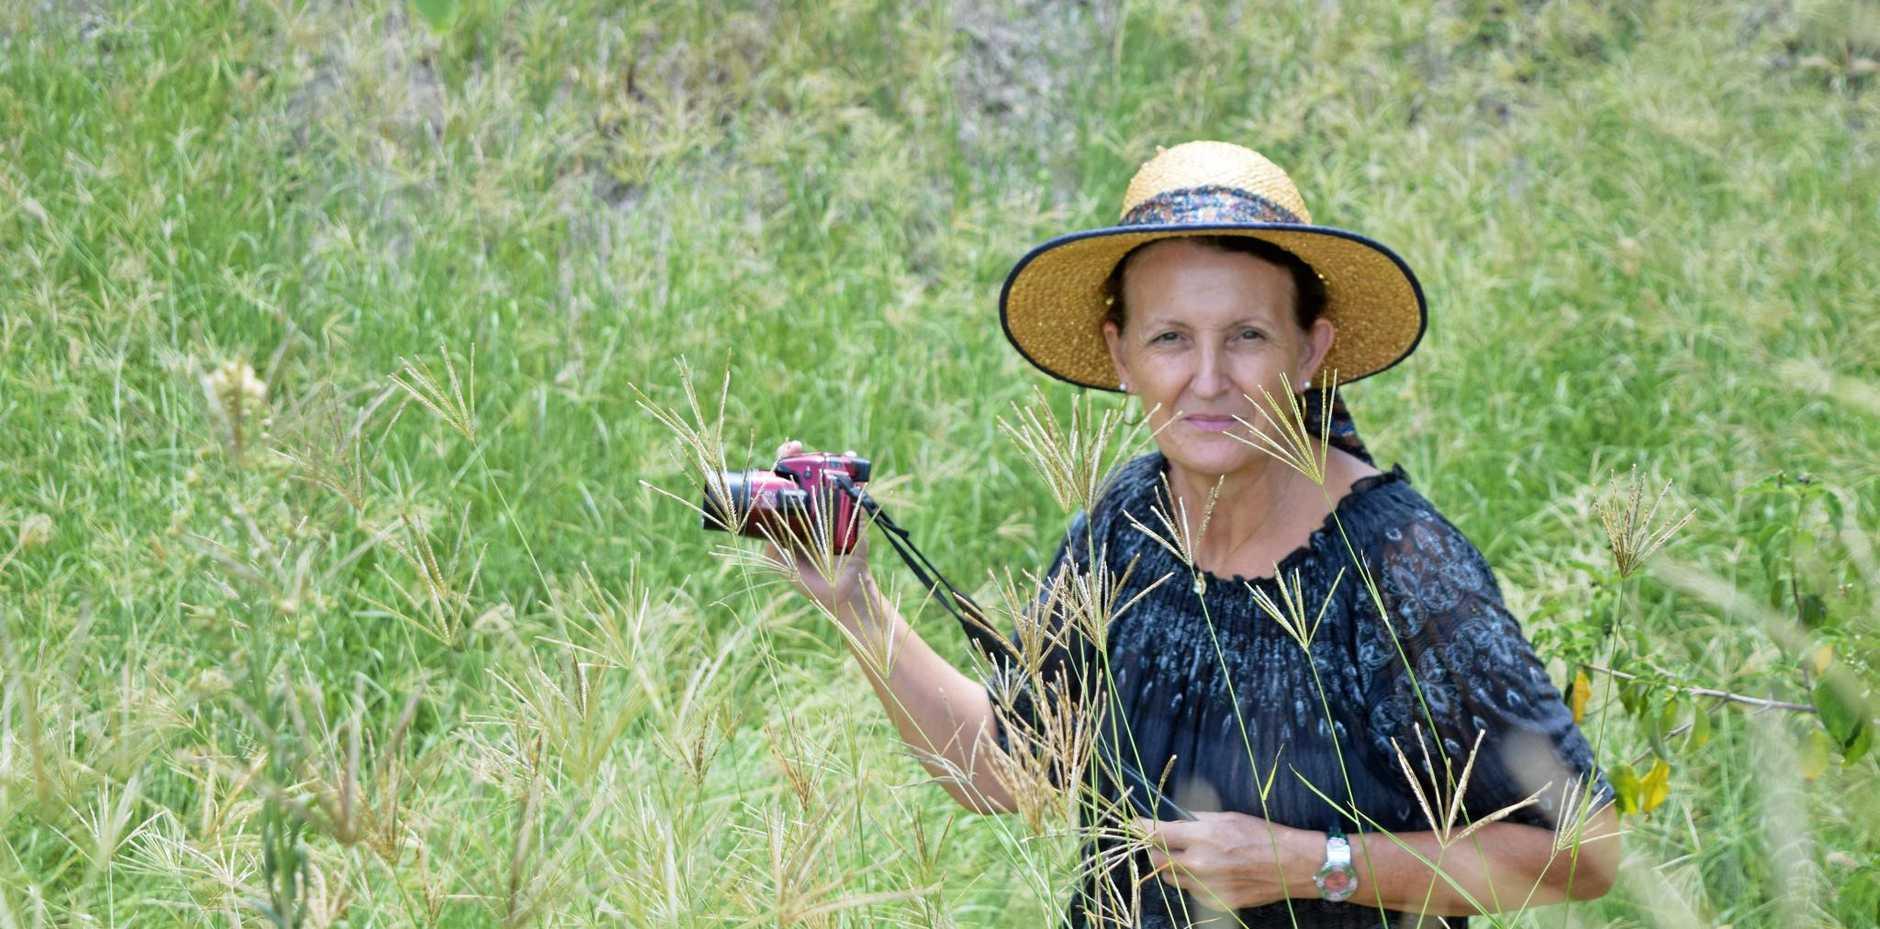 WETLANDS WONDER: Donna Maria Colbrelli-Adams taking photos at the wetlands. LEFT: The Jabiru Geneebeinga sculpture. BELOW: A black rooster at the wetlands.